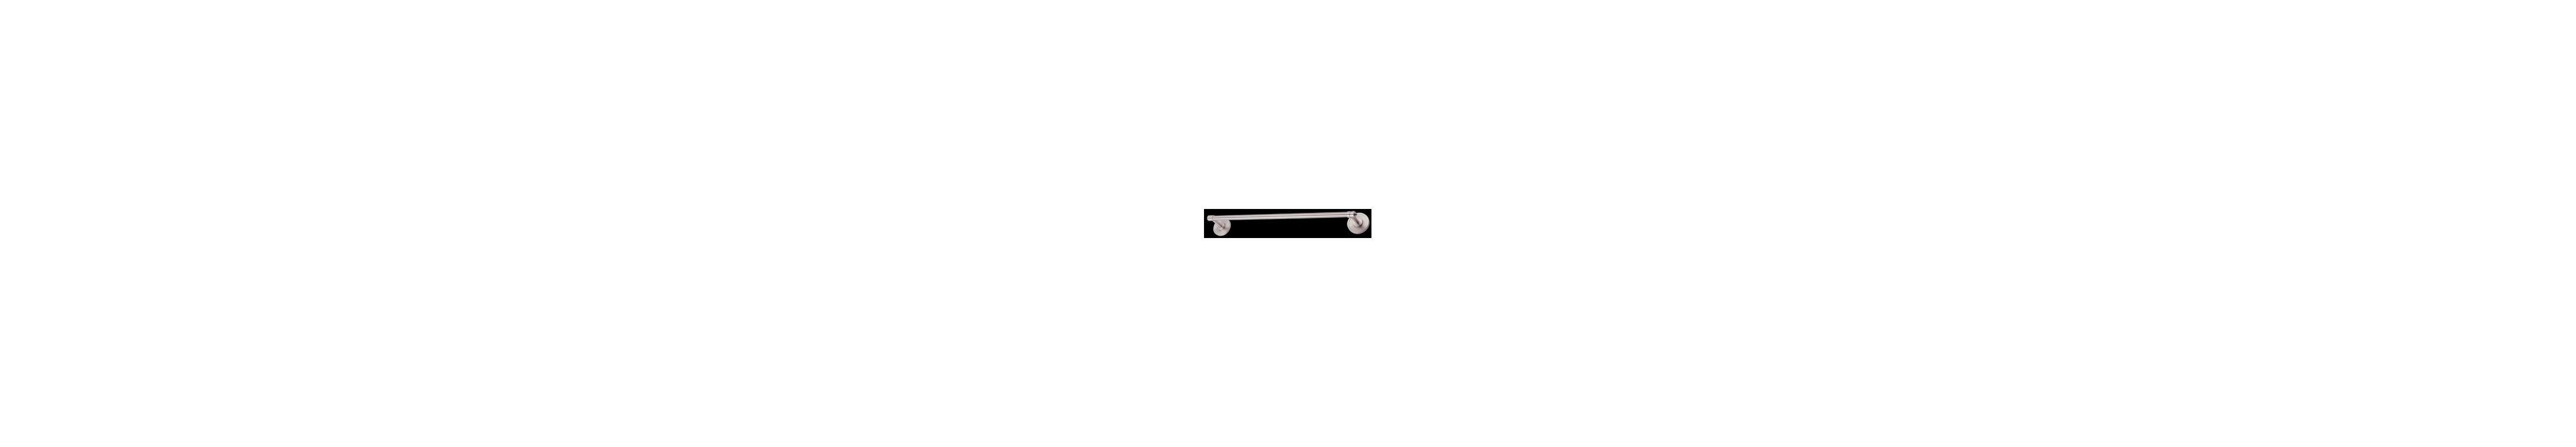 "DVI Lighting DVP3680 1 Light 18"" Towel Bar from the Dominion"